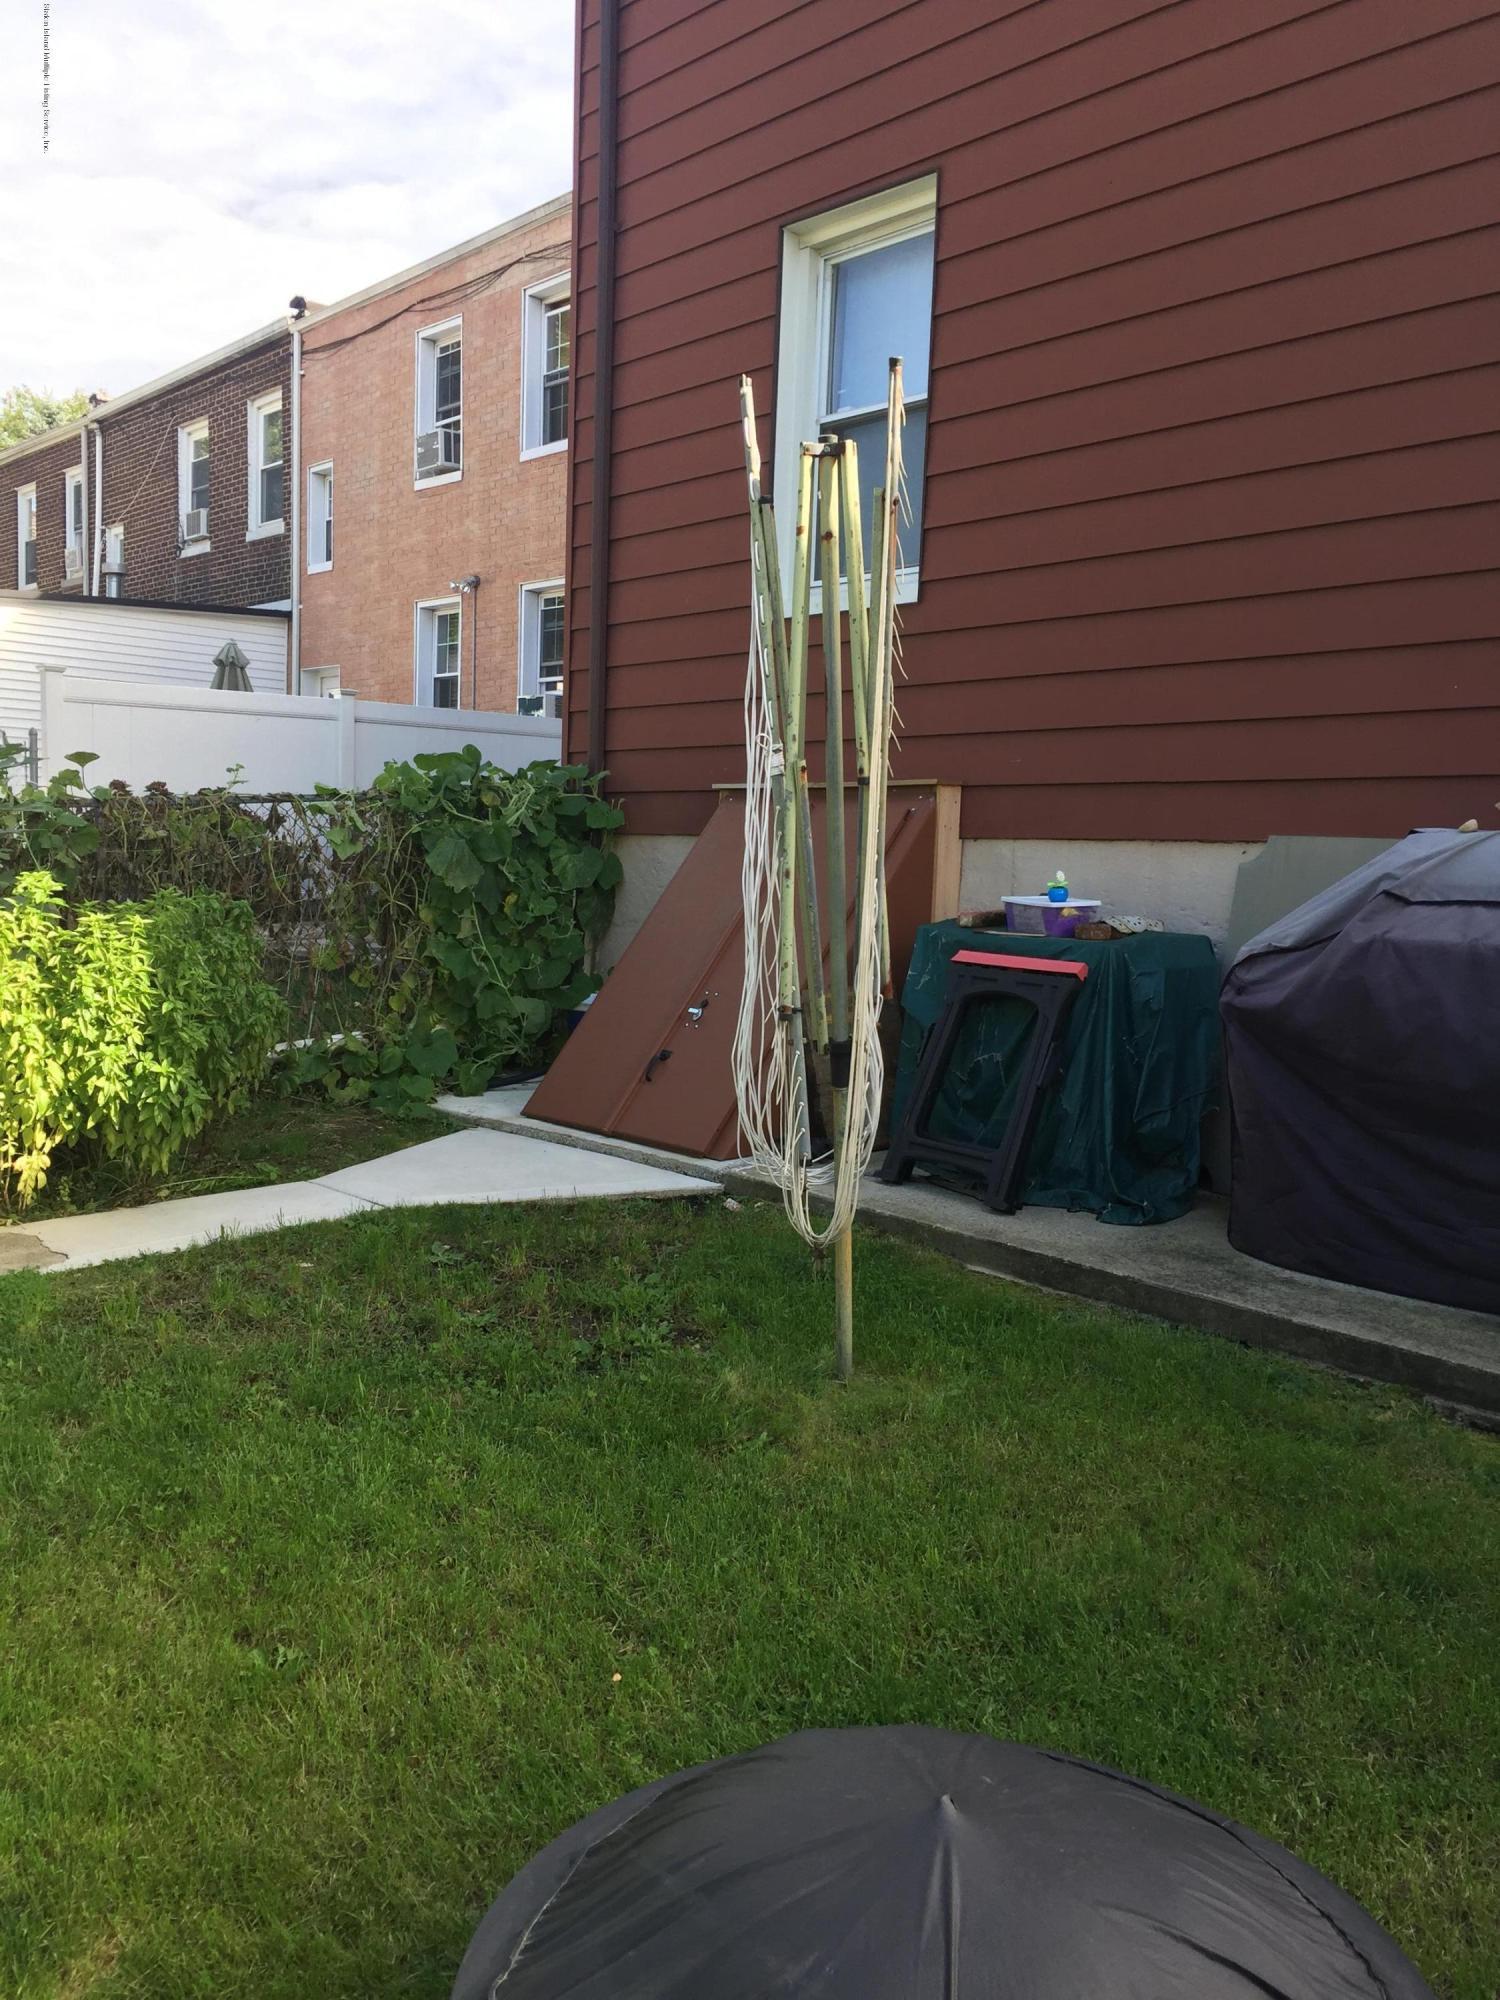 Two Family - Semi-Attached 31 Coale Avenue  Staten Island, NY 10314, MLS-1123386-34